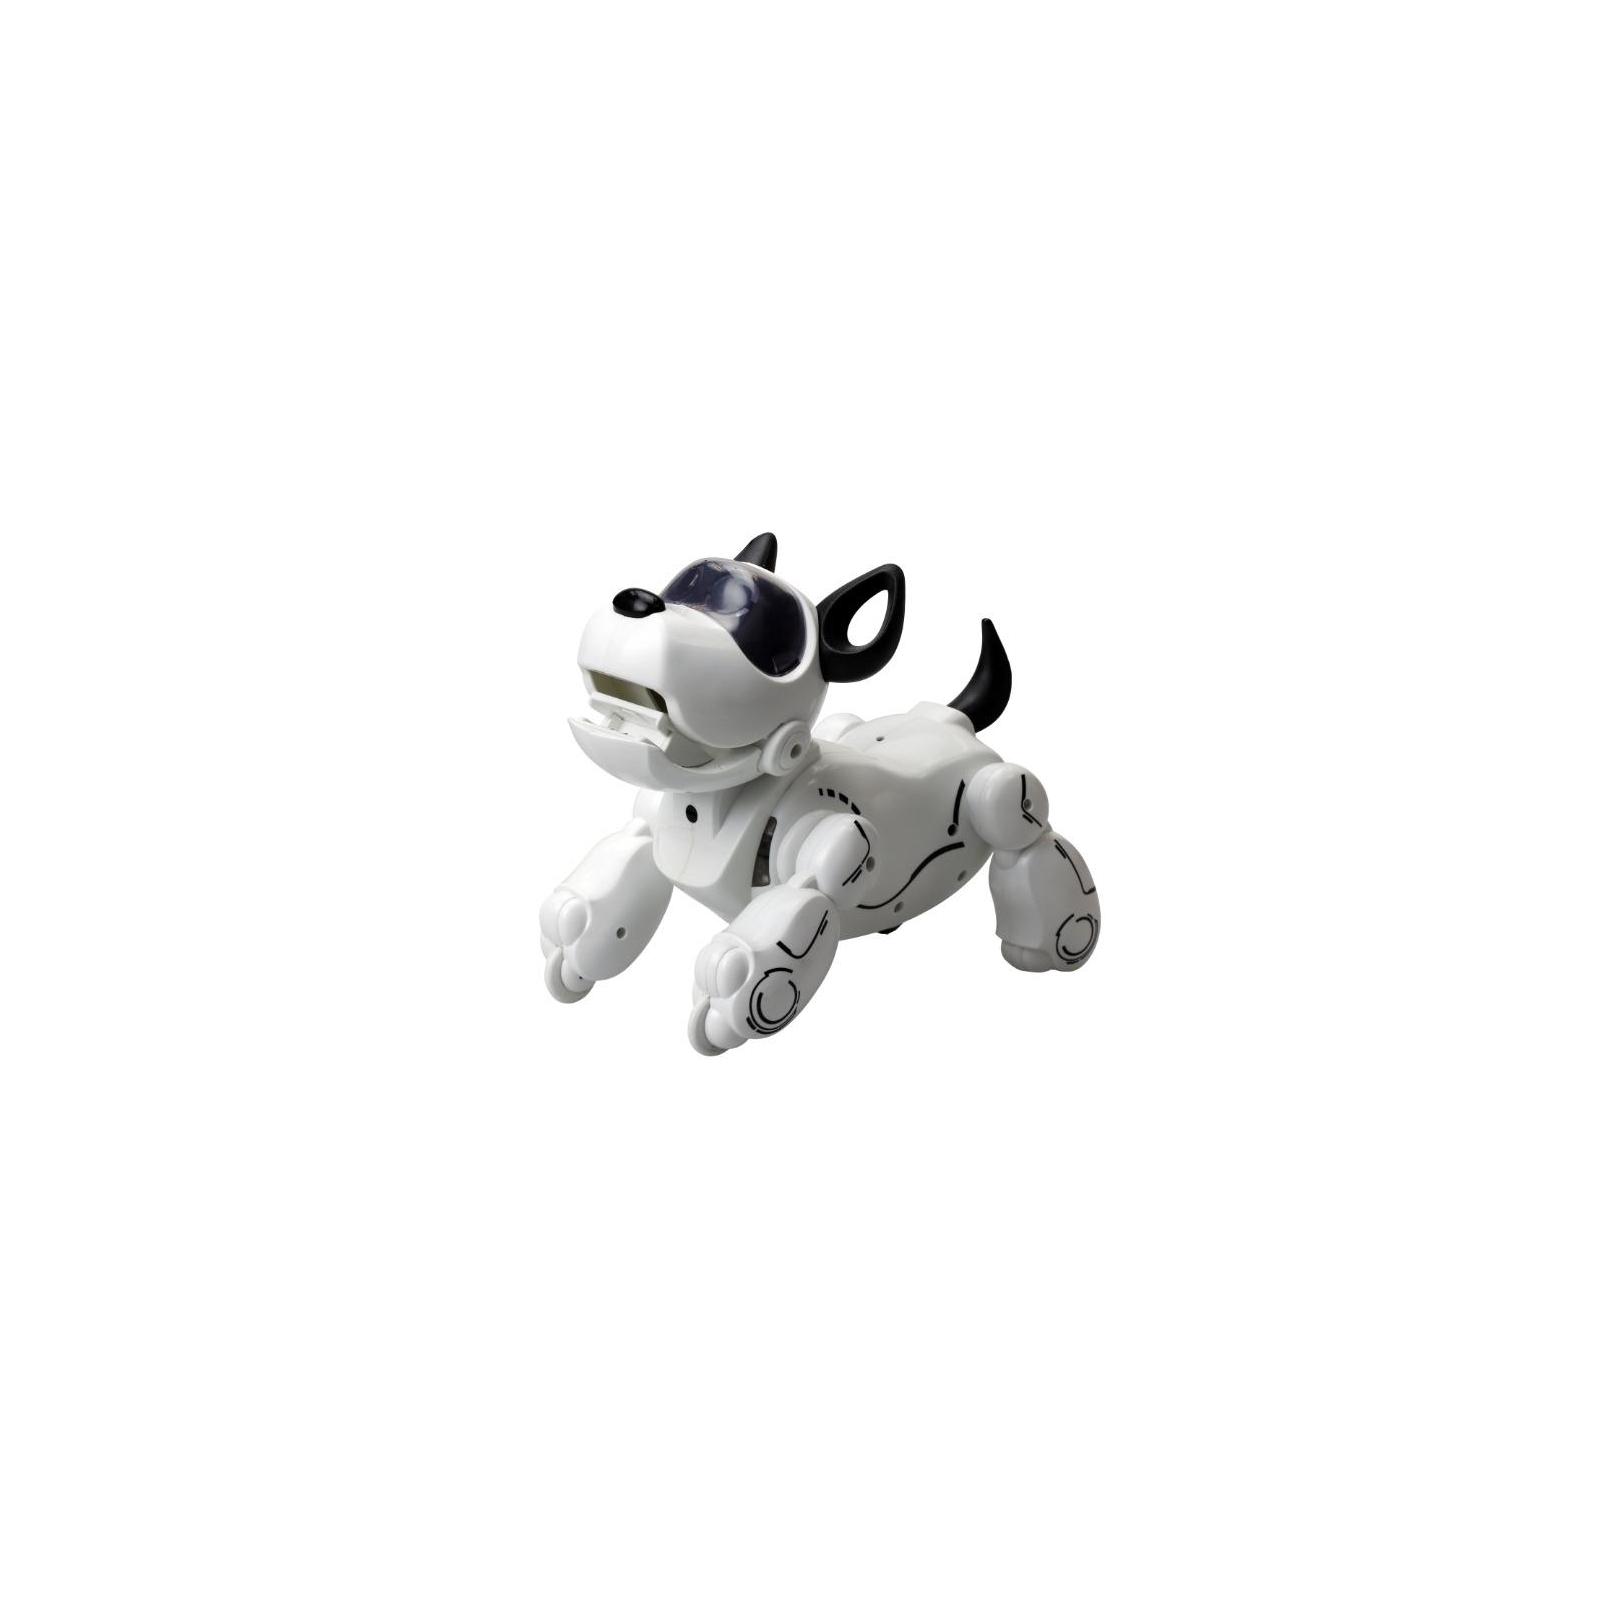 Интерактивная игрушка Silverlit собака-робот PUPBO (88520)